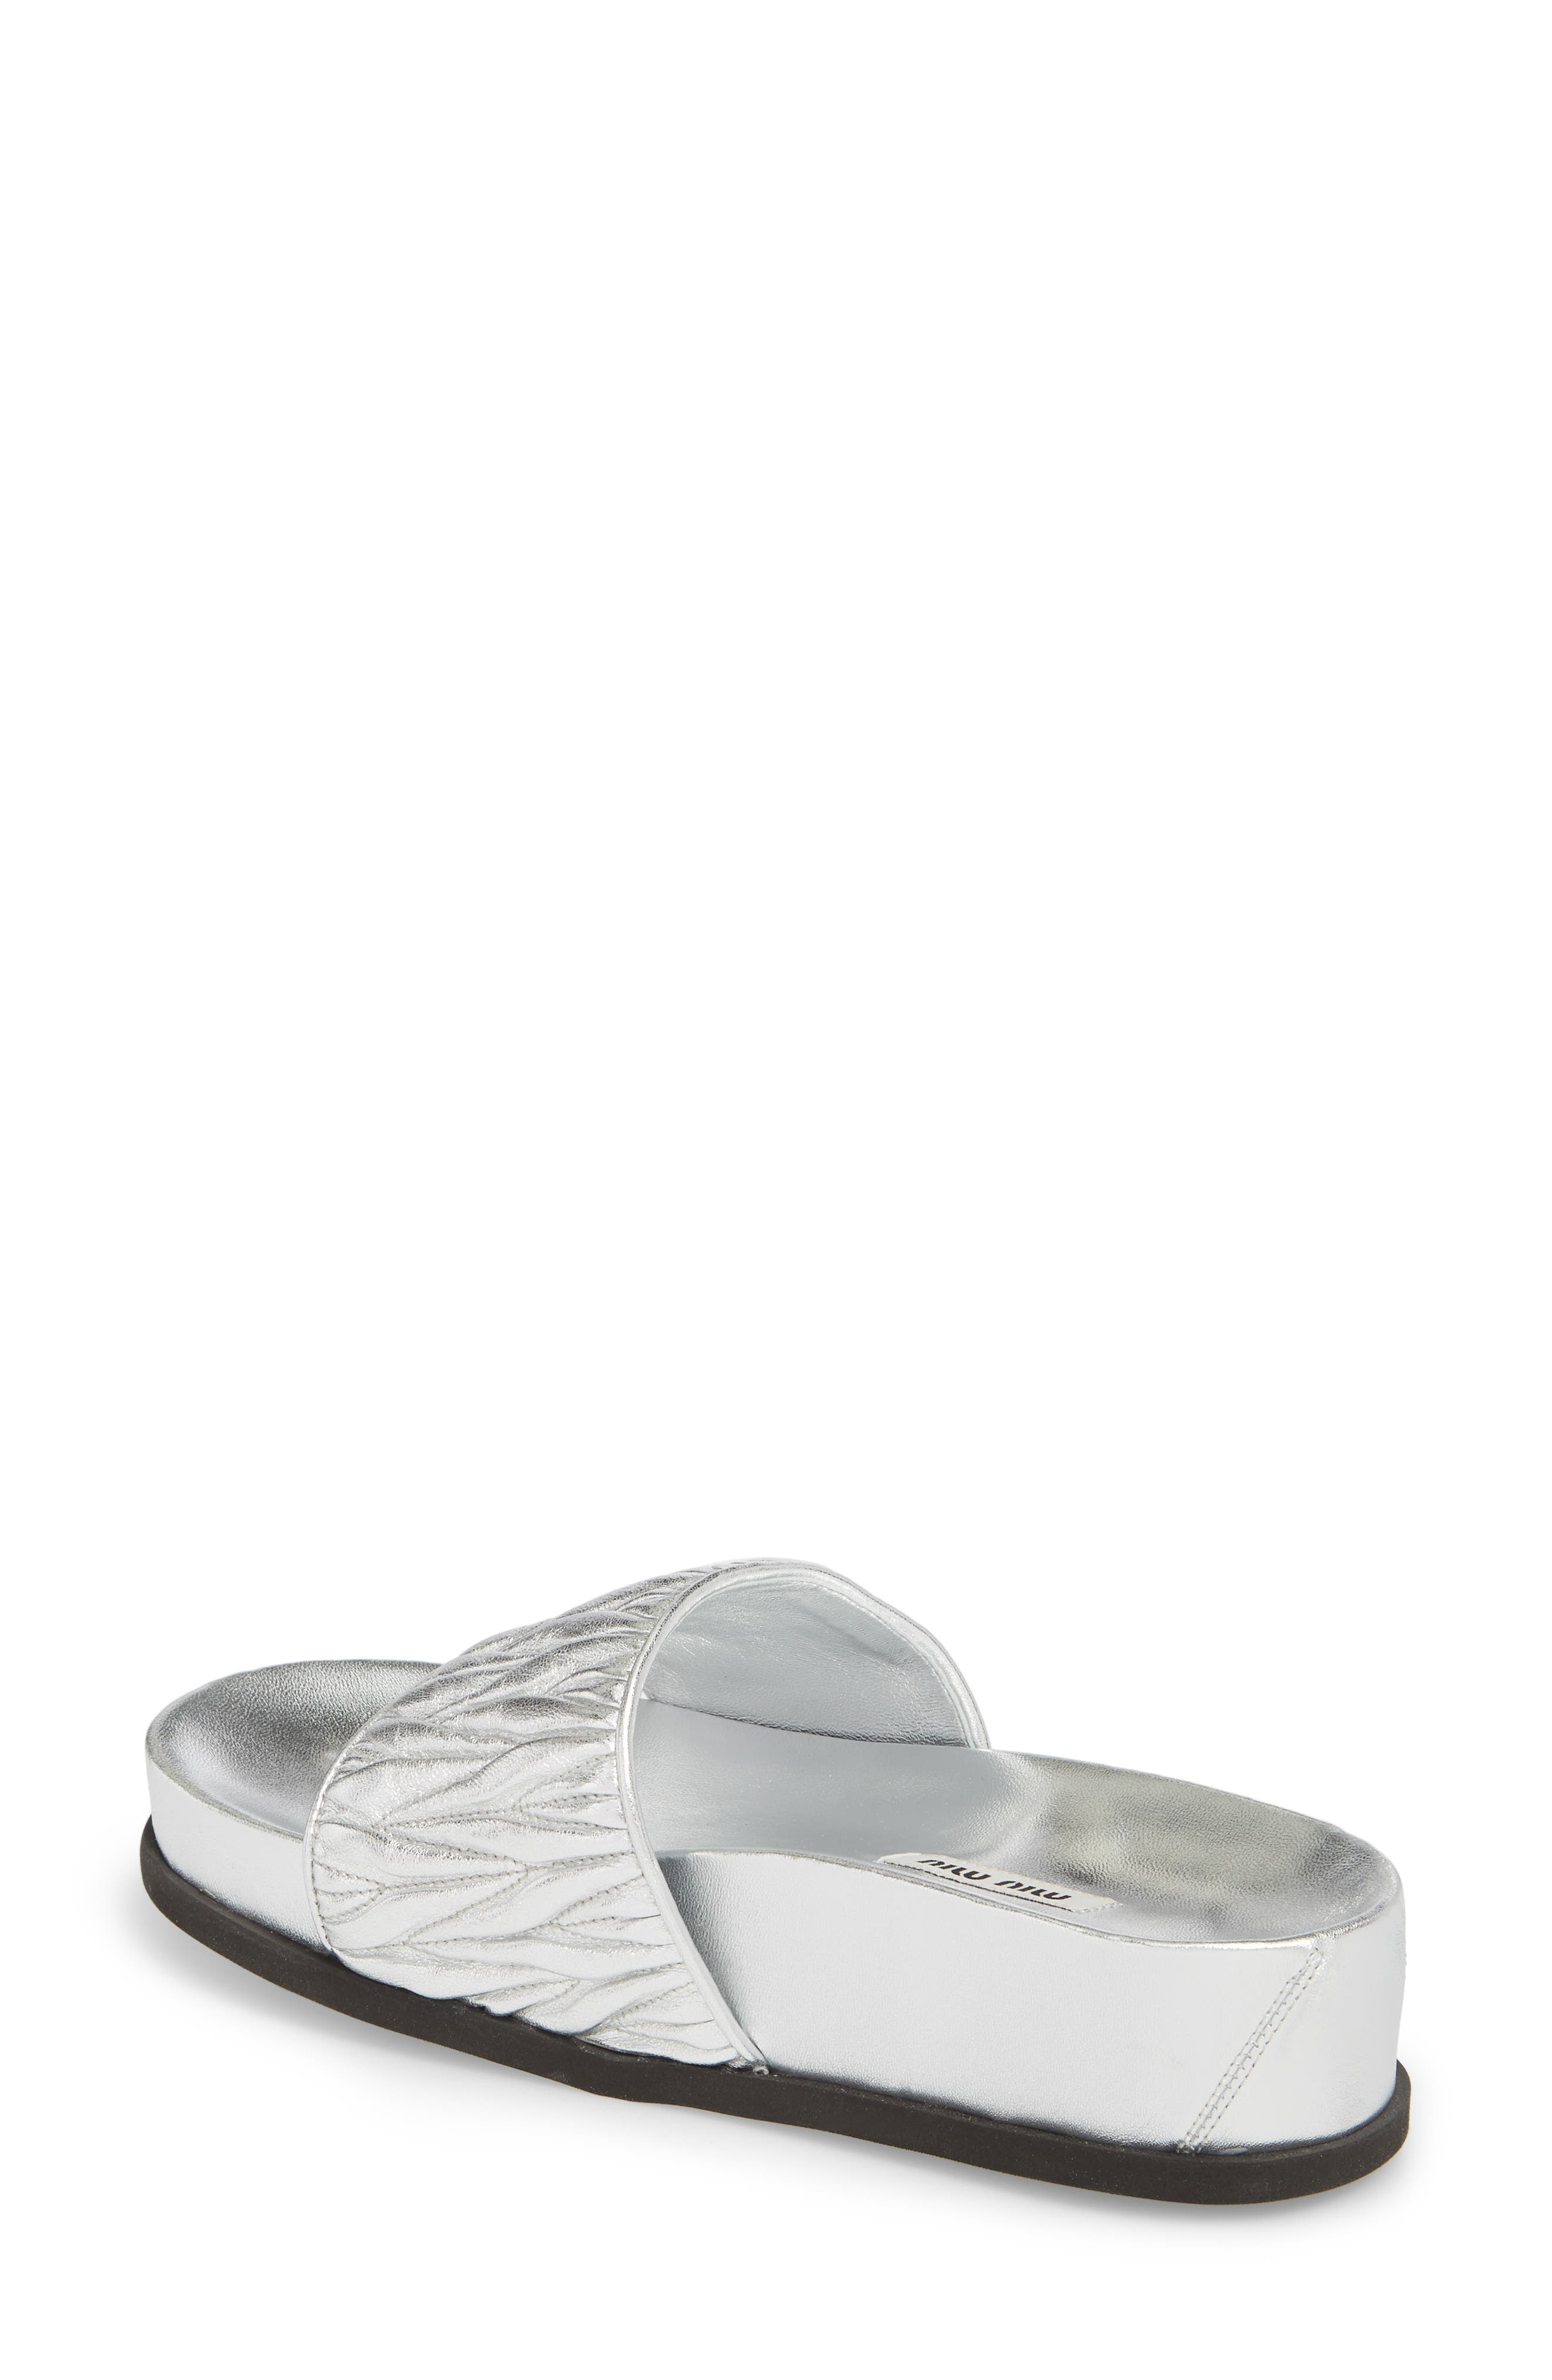 Matelassé Slide Sandal,                             Alternate thumbnail 2, color,                             Silver